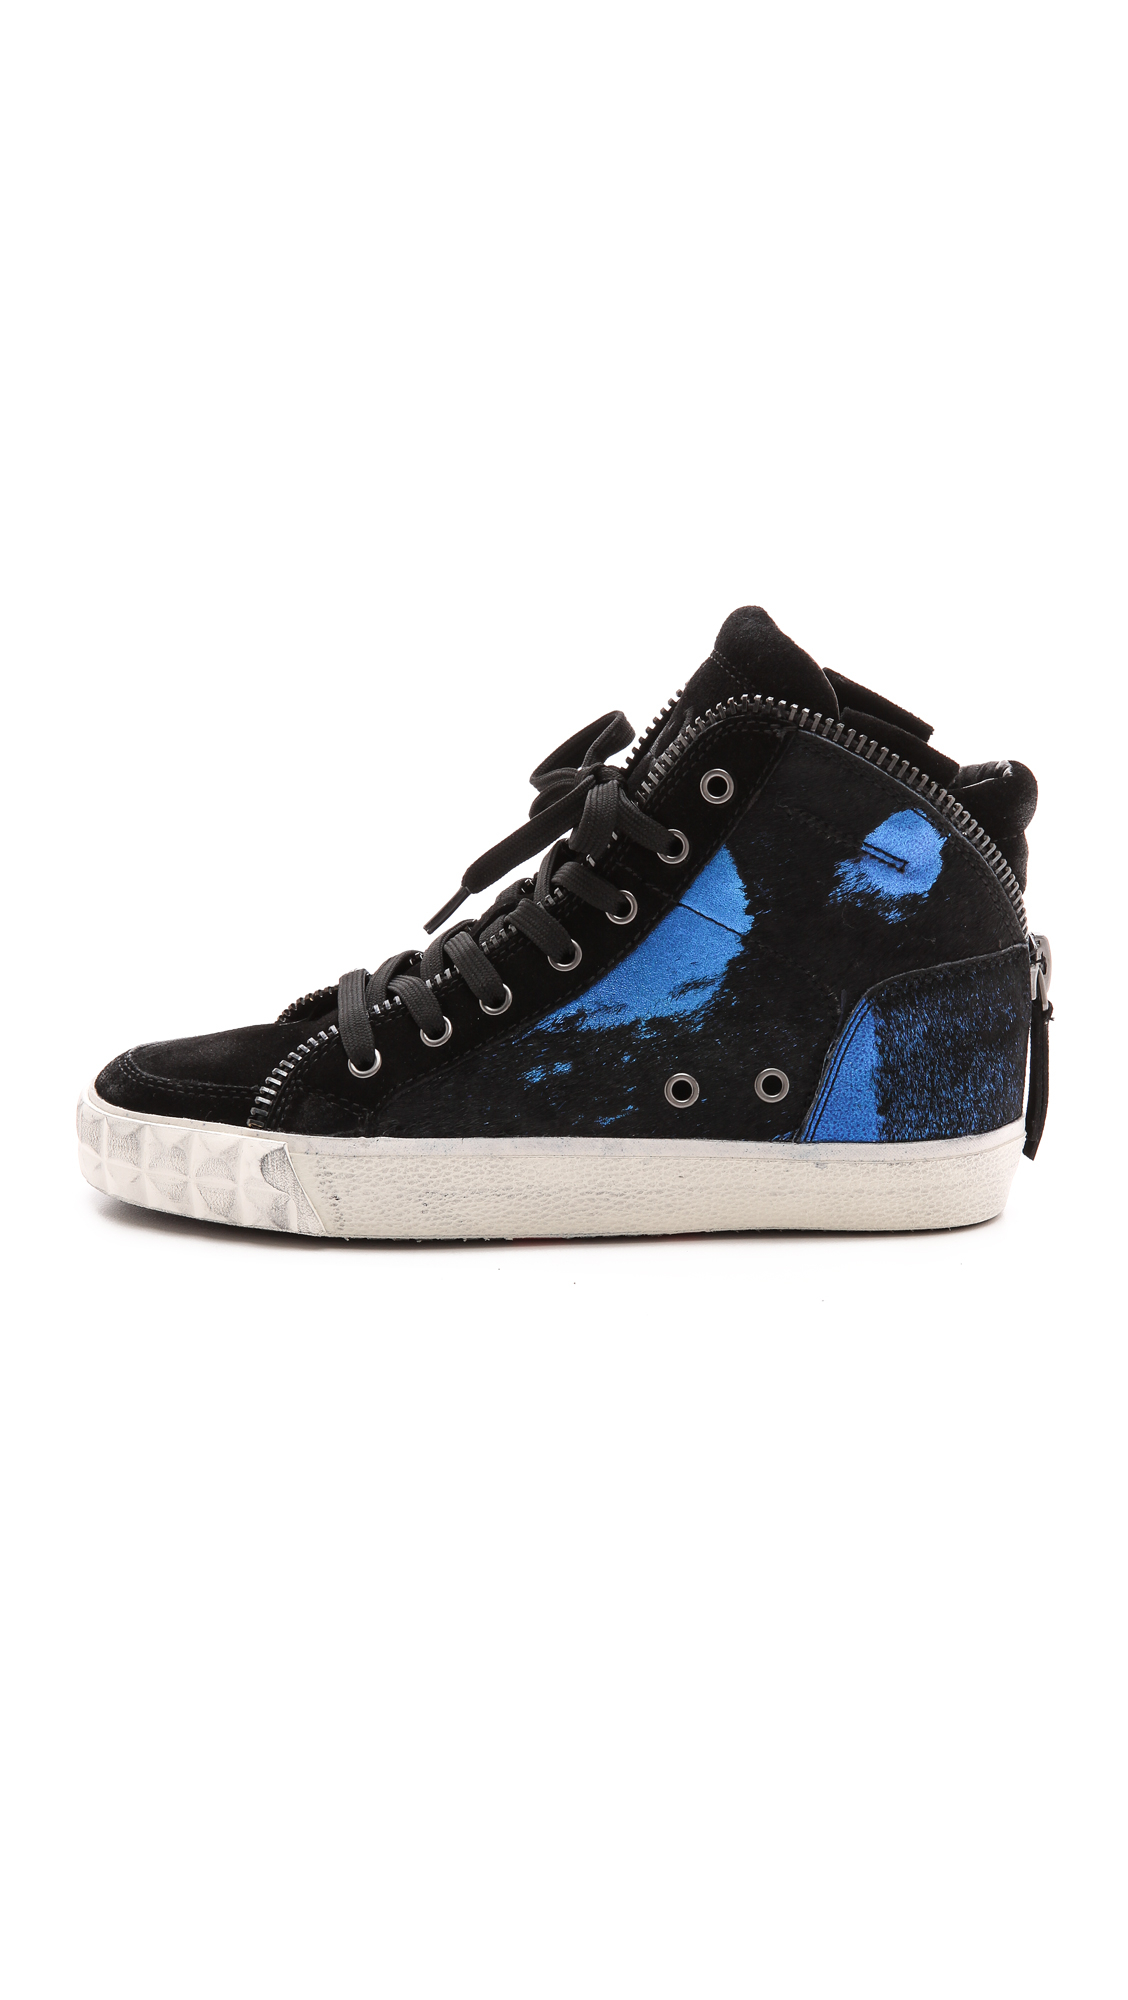 ash shake bis haircalf high top sneakers black black blue black in blue black black blue. Black Bedroom Furniture Sets. Home Design Ideas